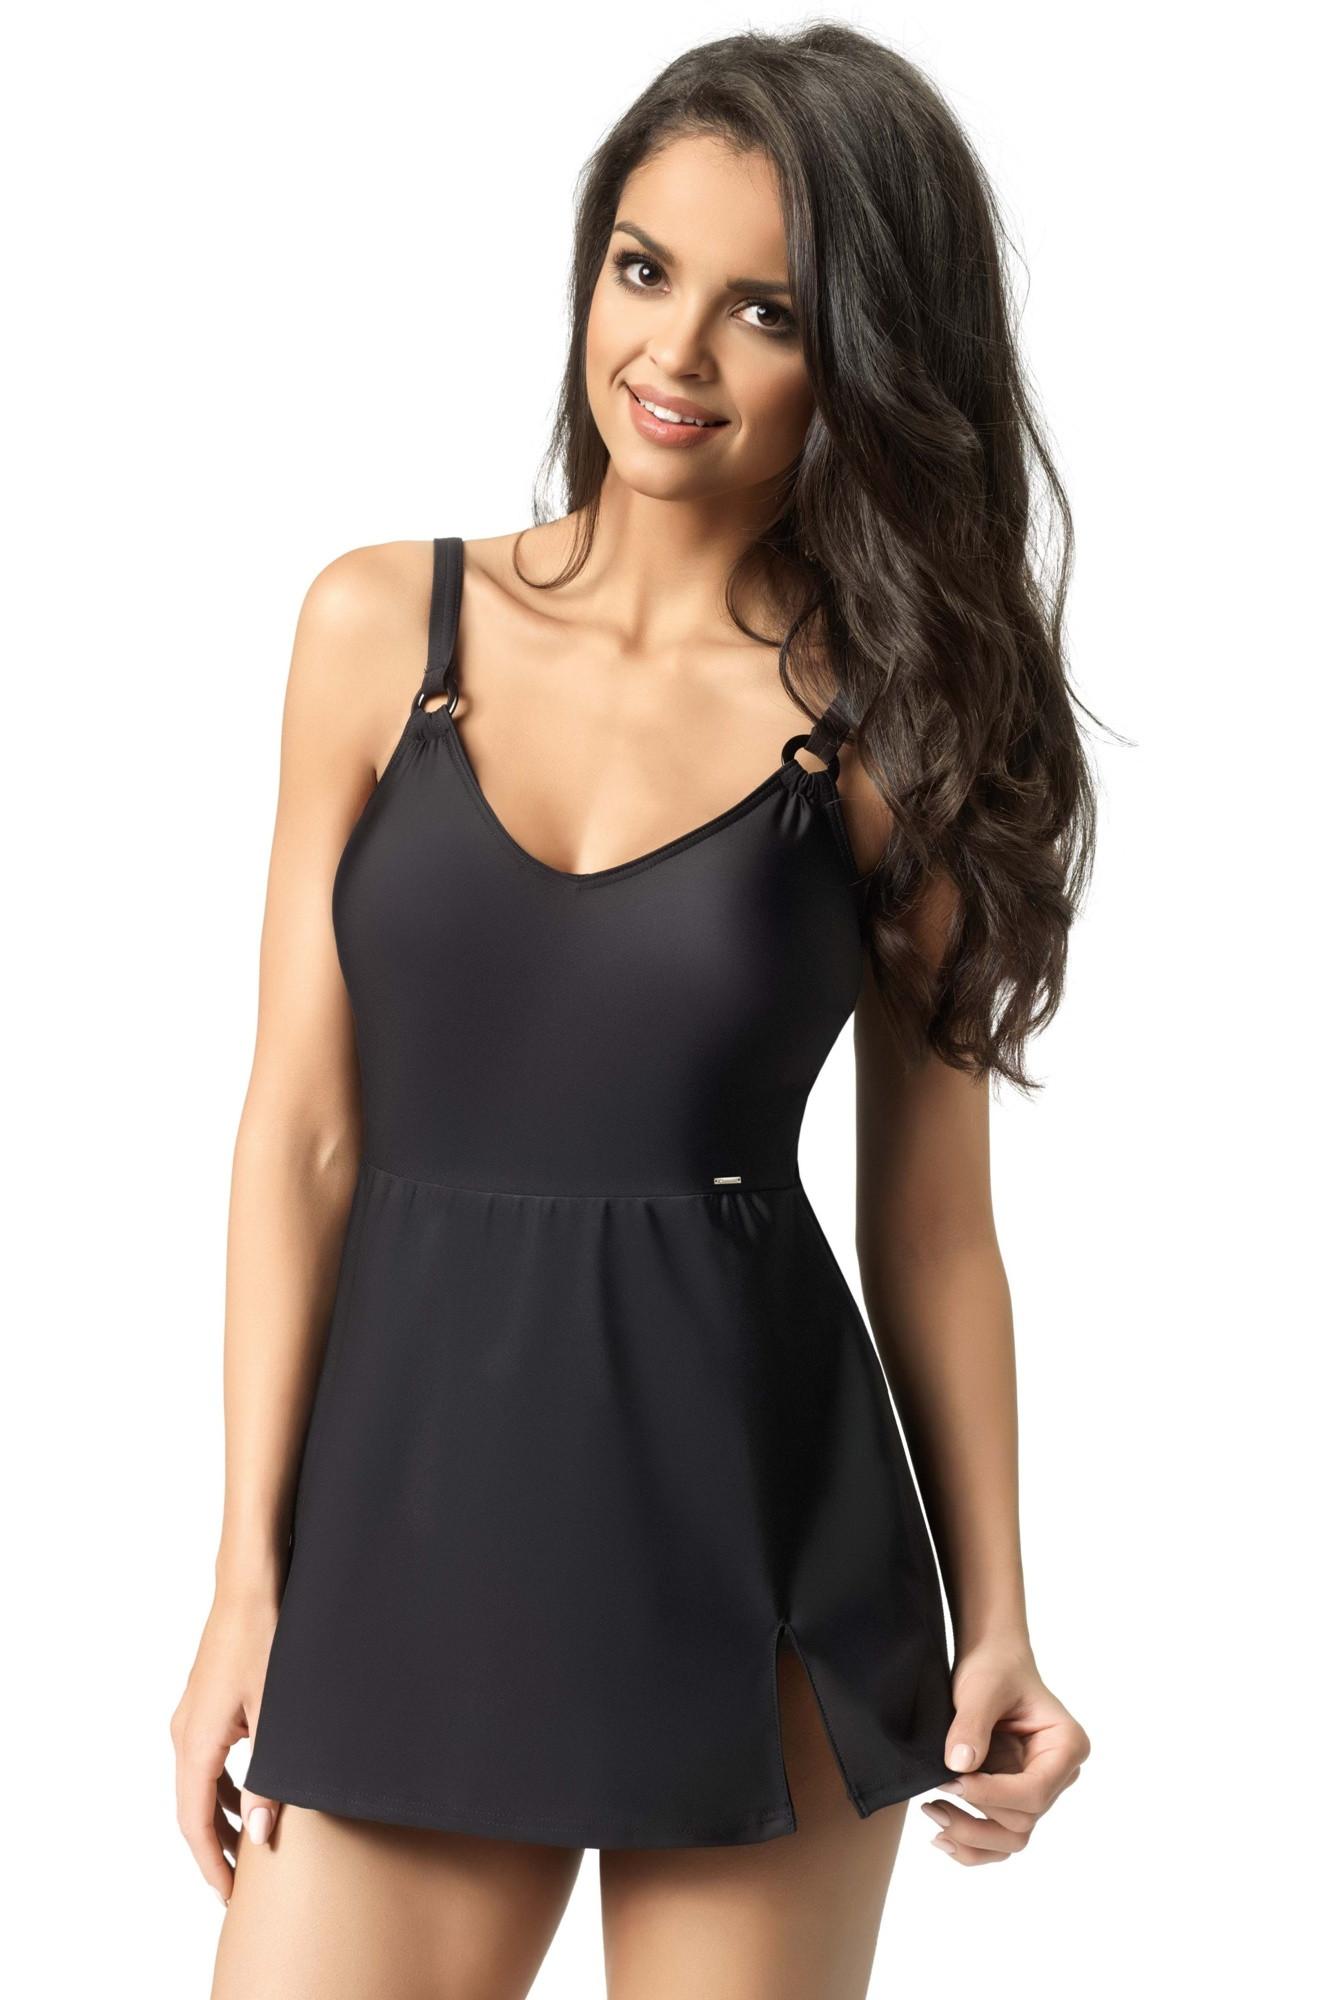 Plavkové šaty Claudia - Gwinner Barva: černá, Velikost: 44